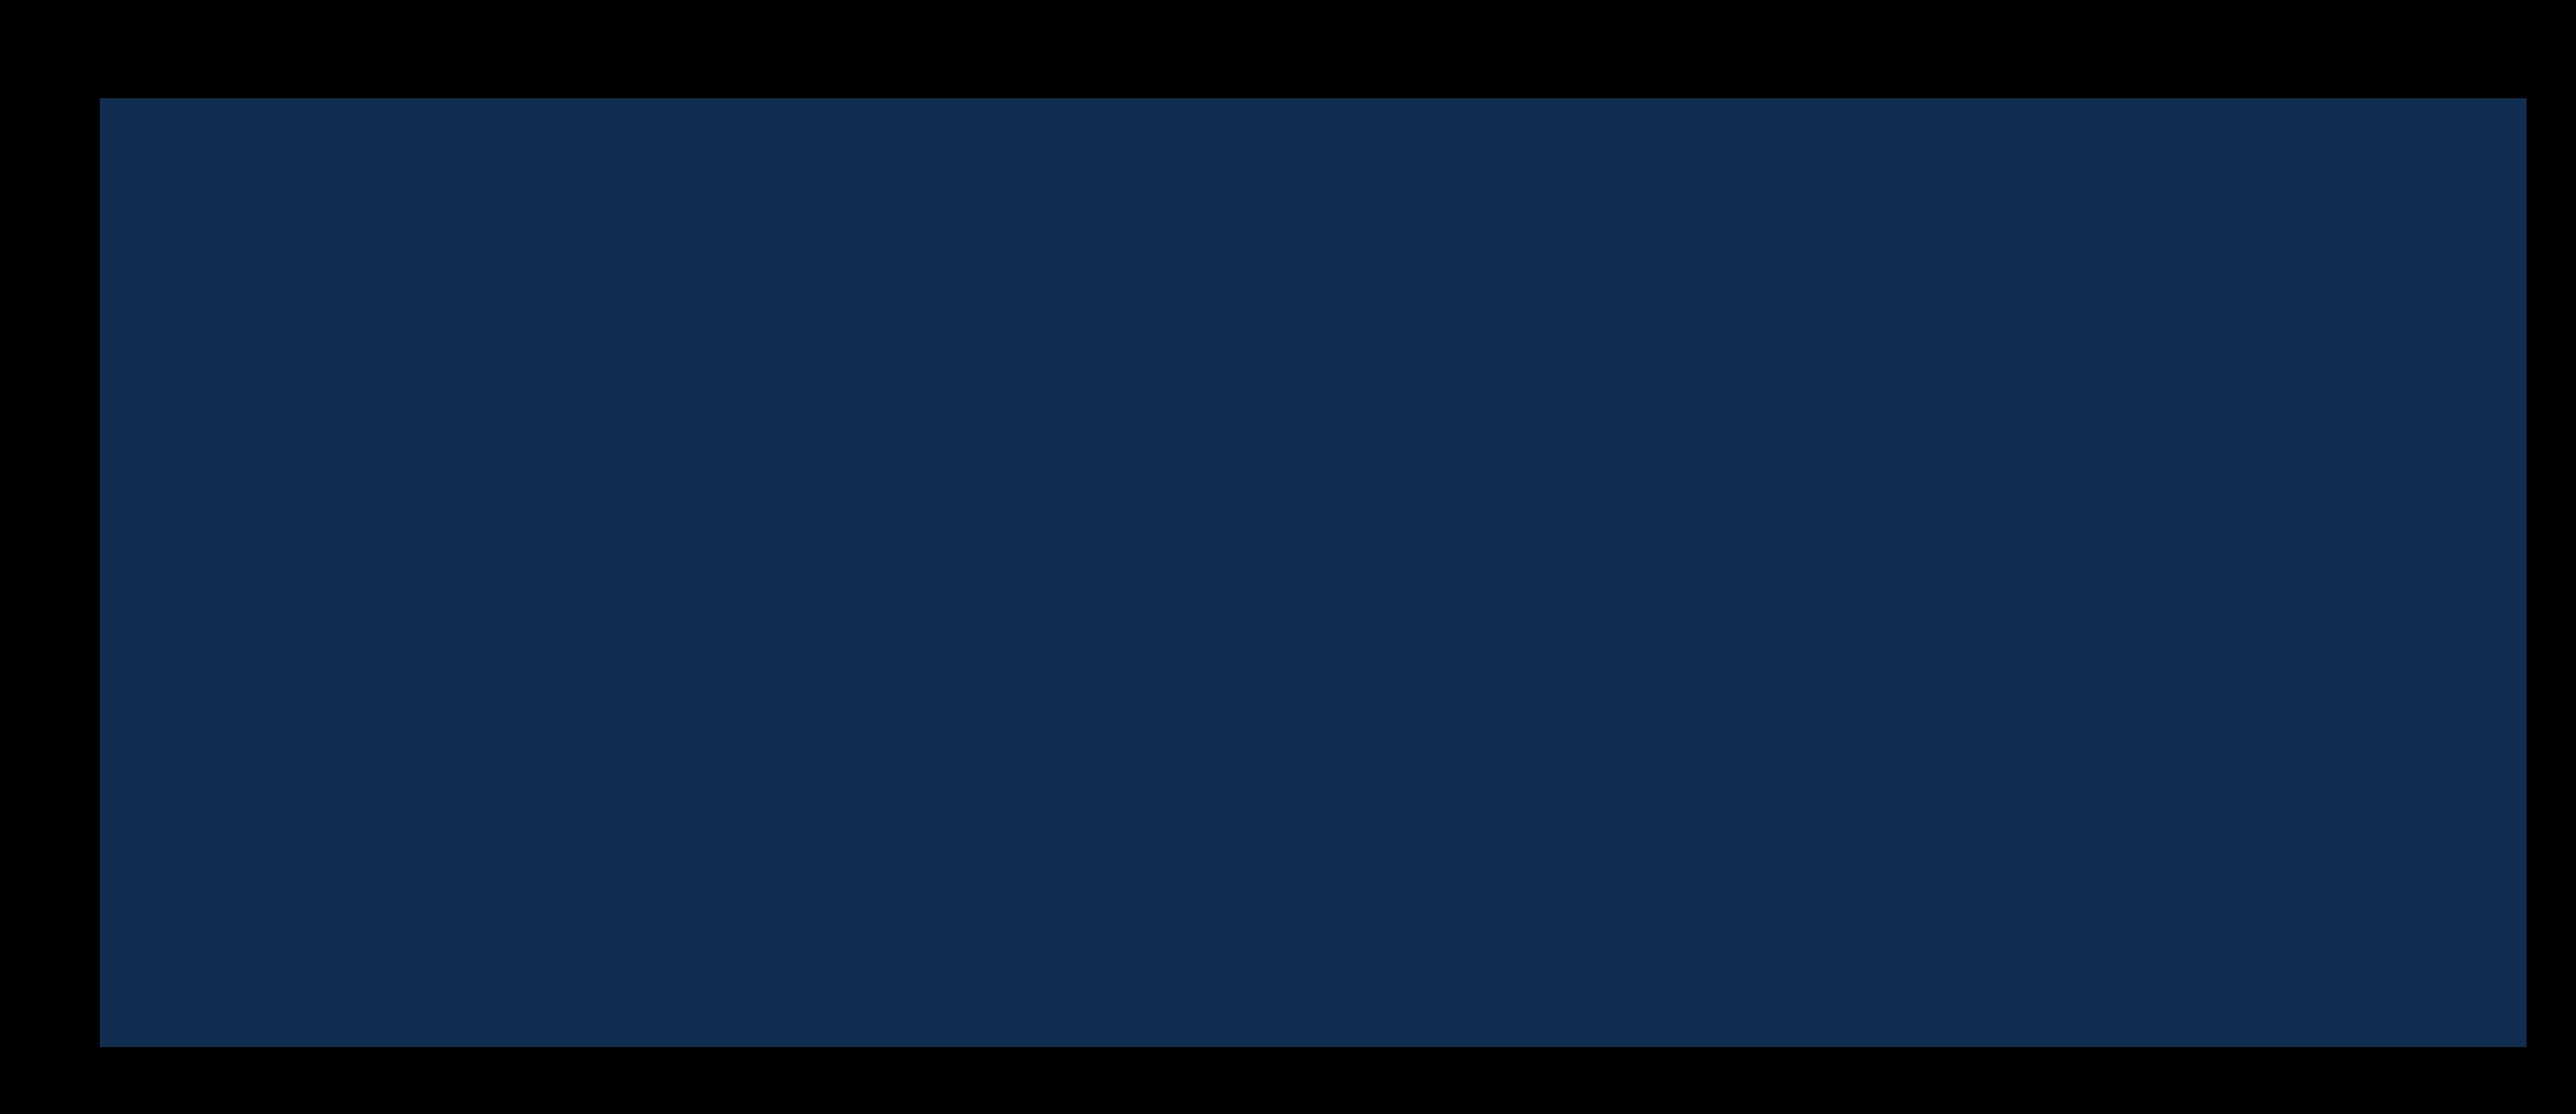 historic_census_form